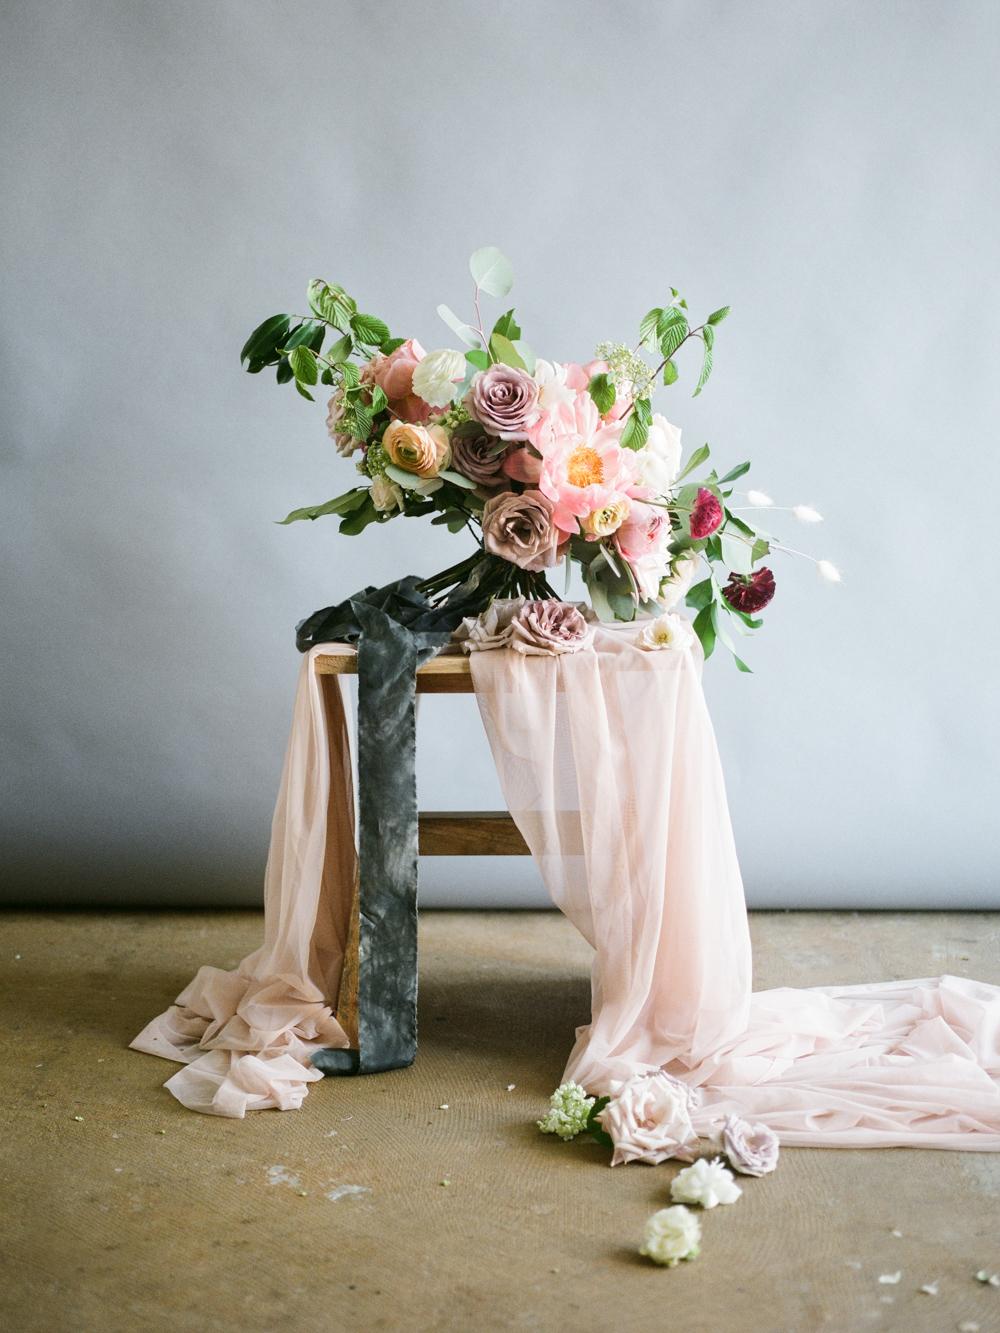 Maxit Flower Design